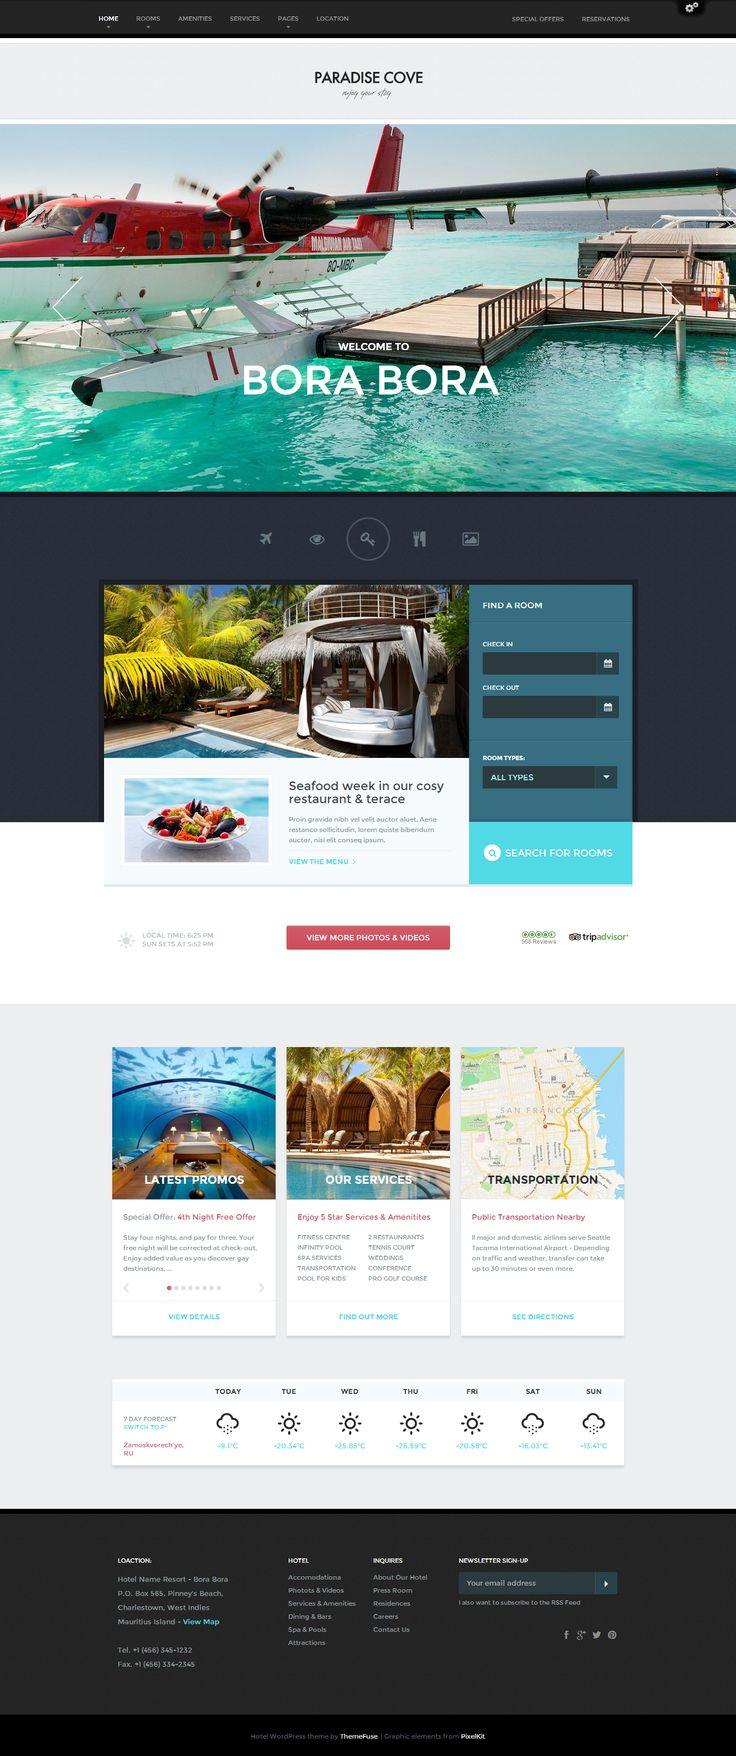 Cassandra cappello graphic design toronto - Paradise Cove Wordpress Hotel Theme Hotel Wordpress Webdesign